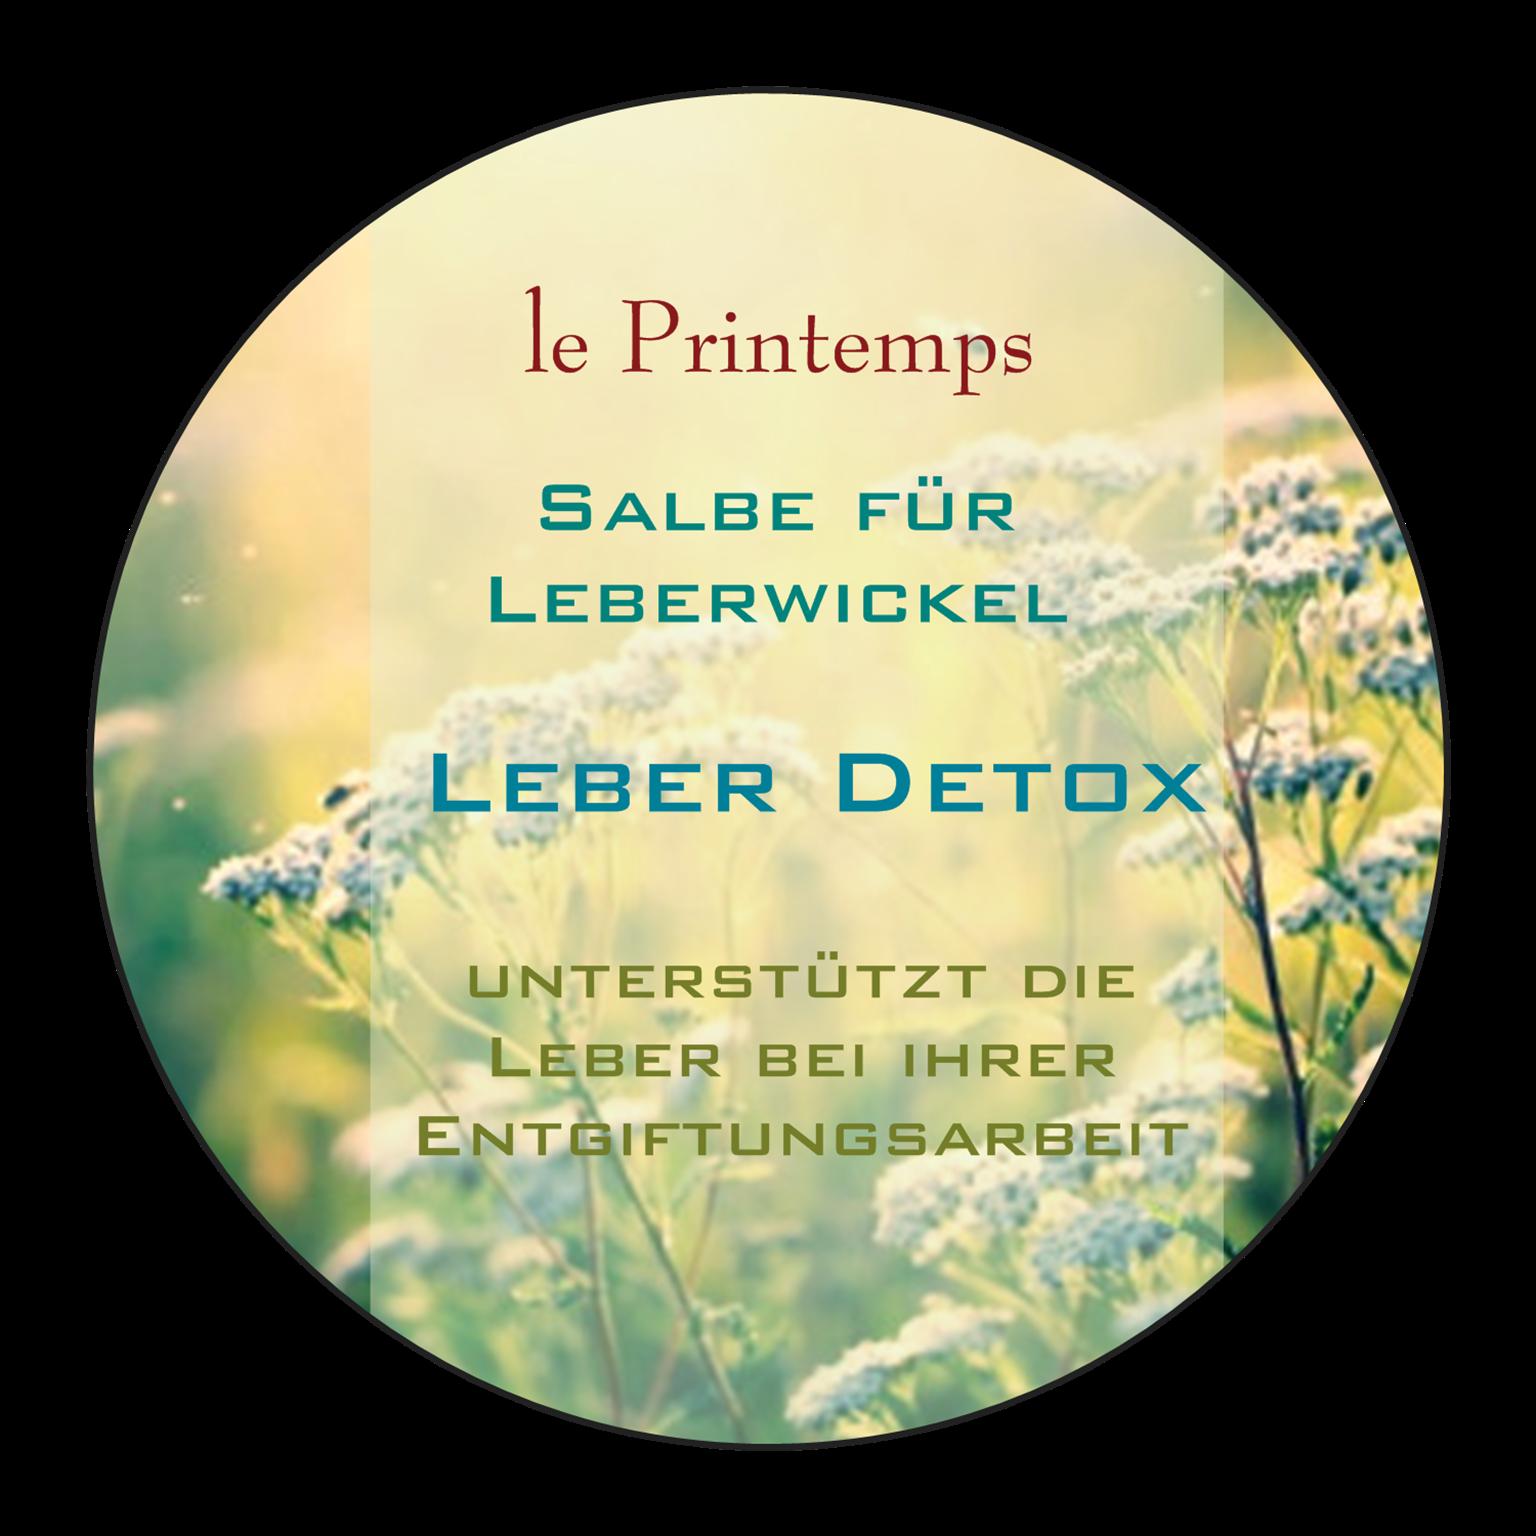 Le Printemps Leber Detox